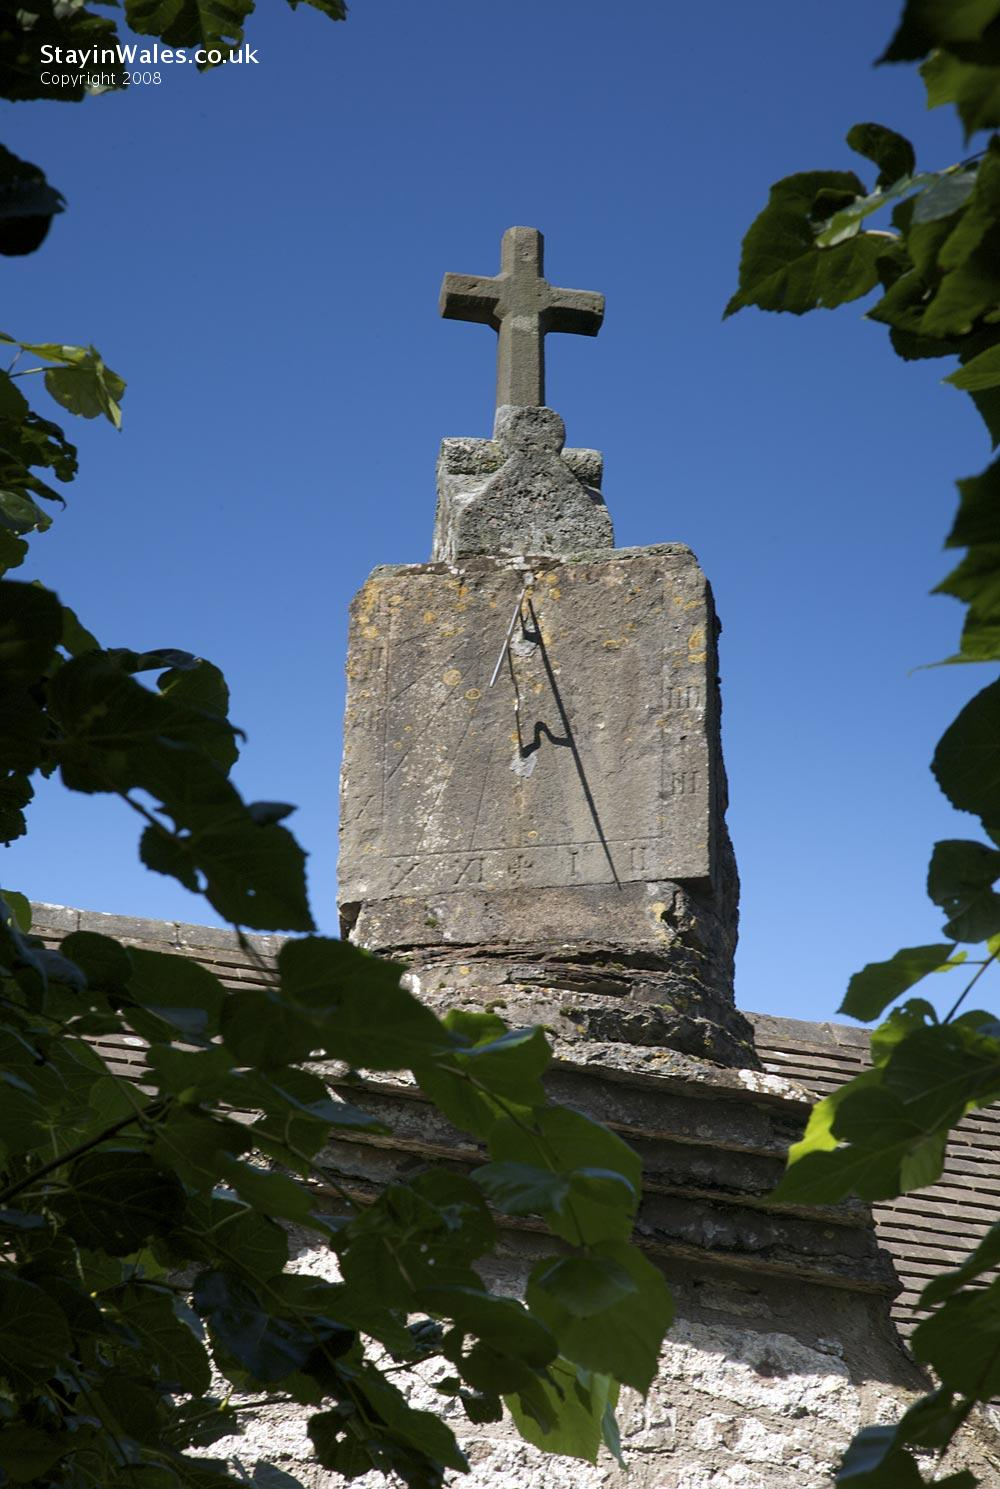 Sundial at Penallt Old Church, Monmouth